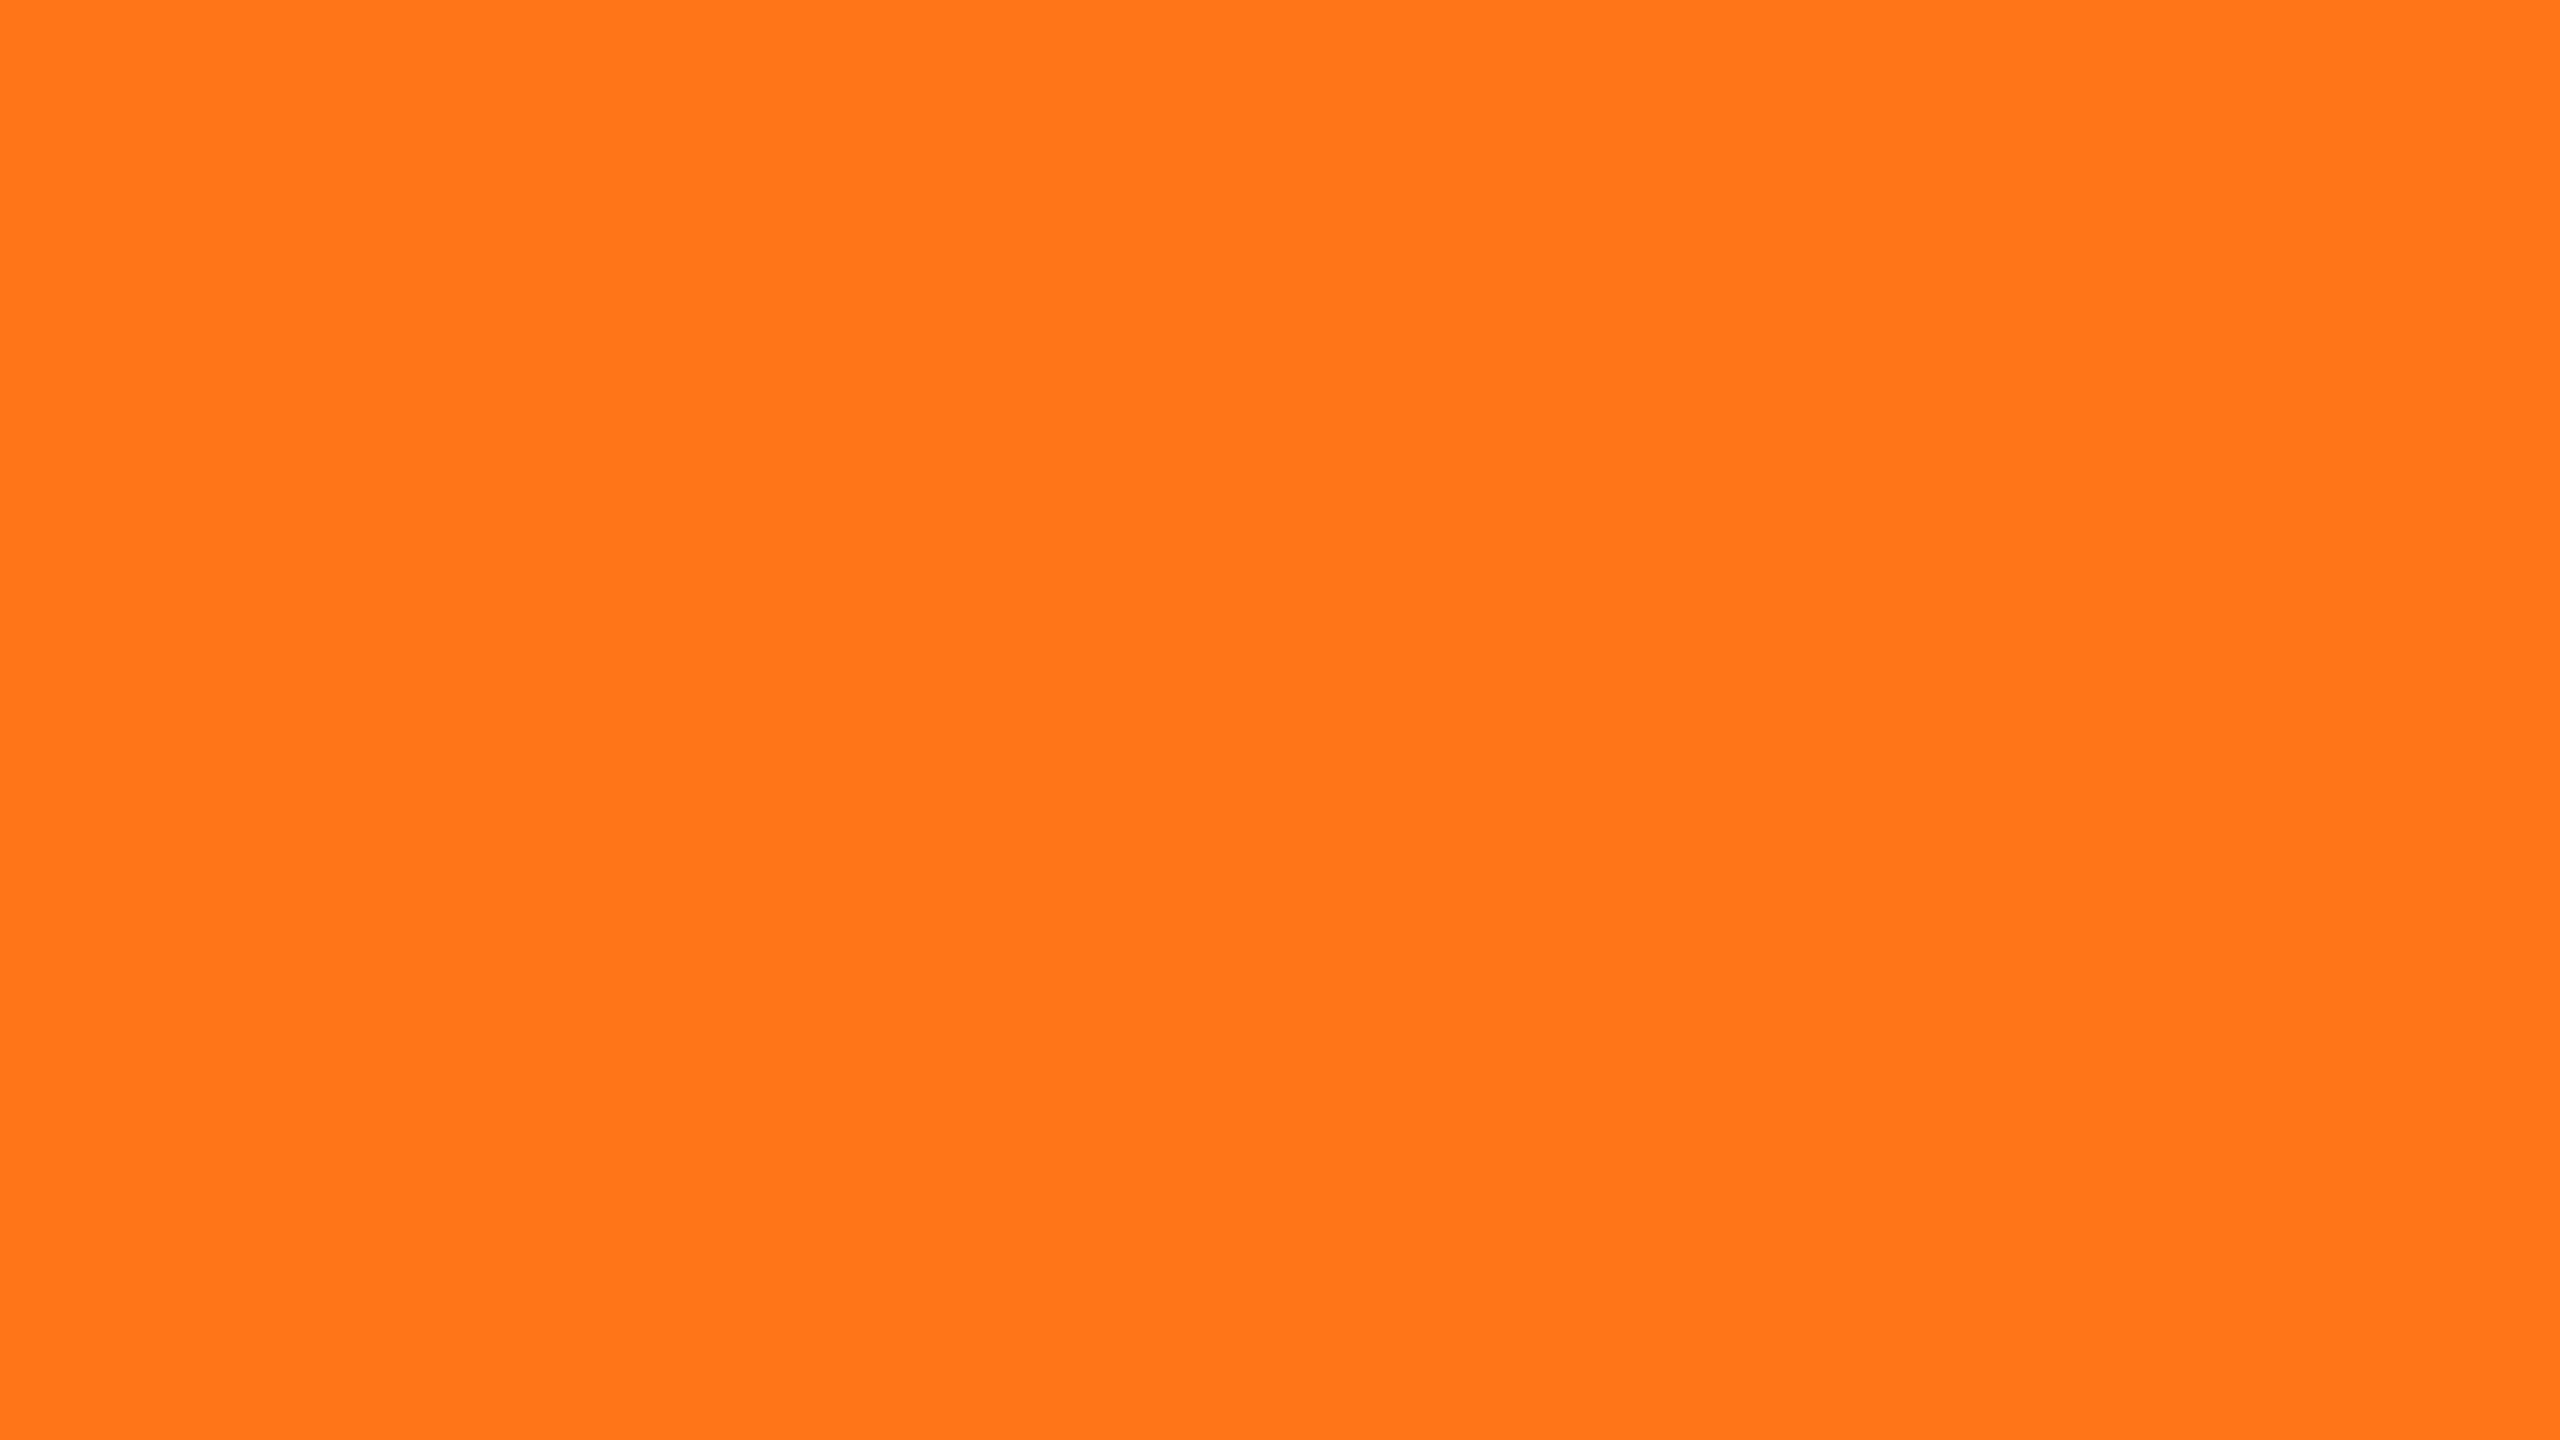 2560x1440 Pumpkin Solid Color Background